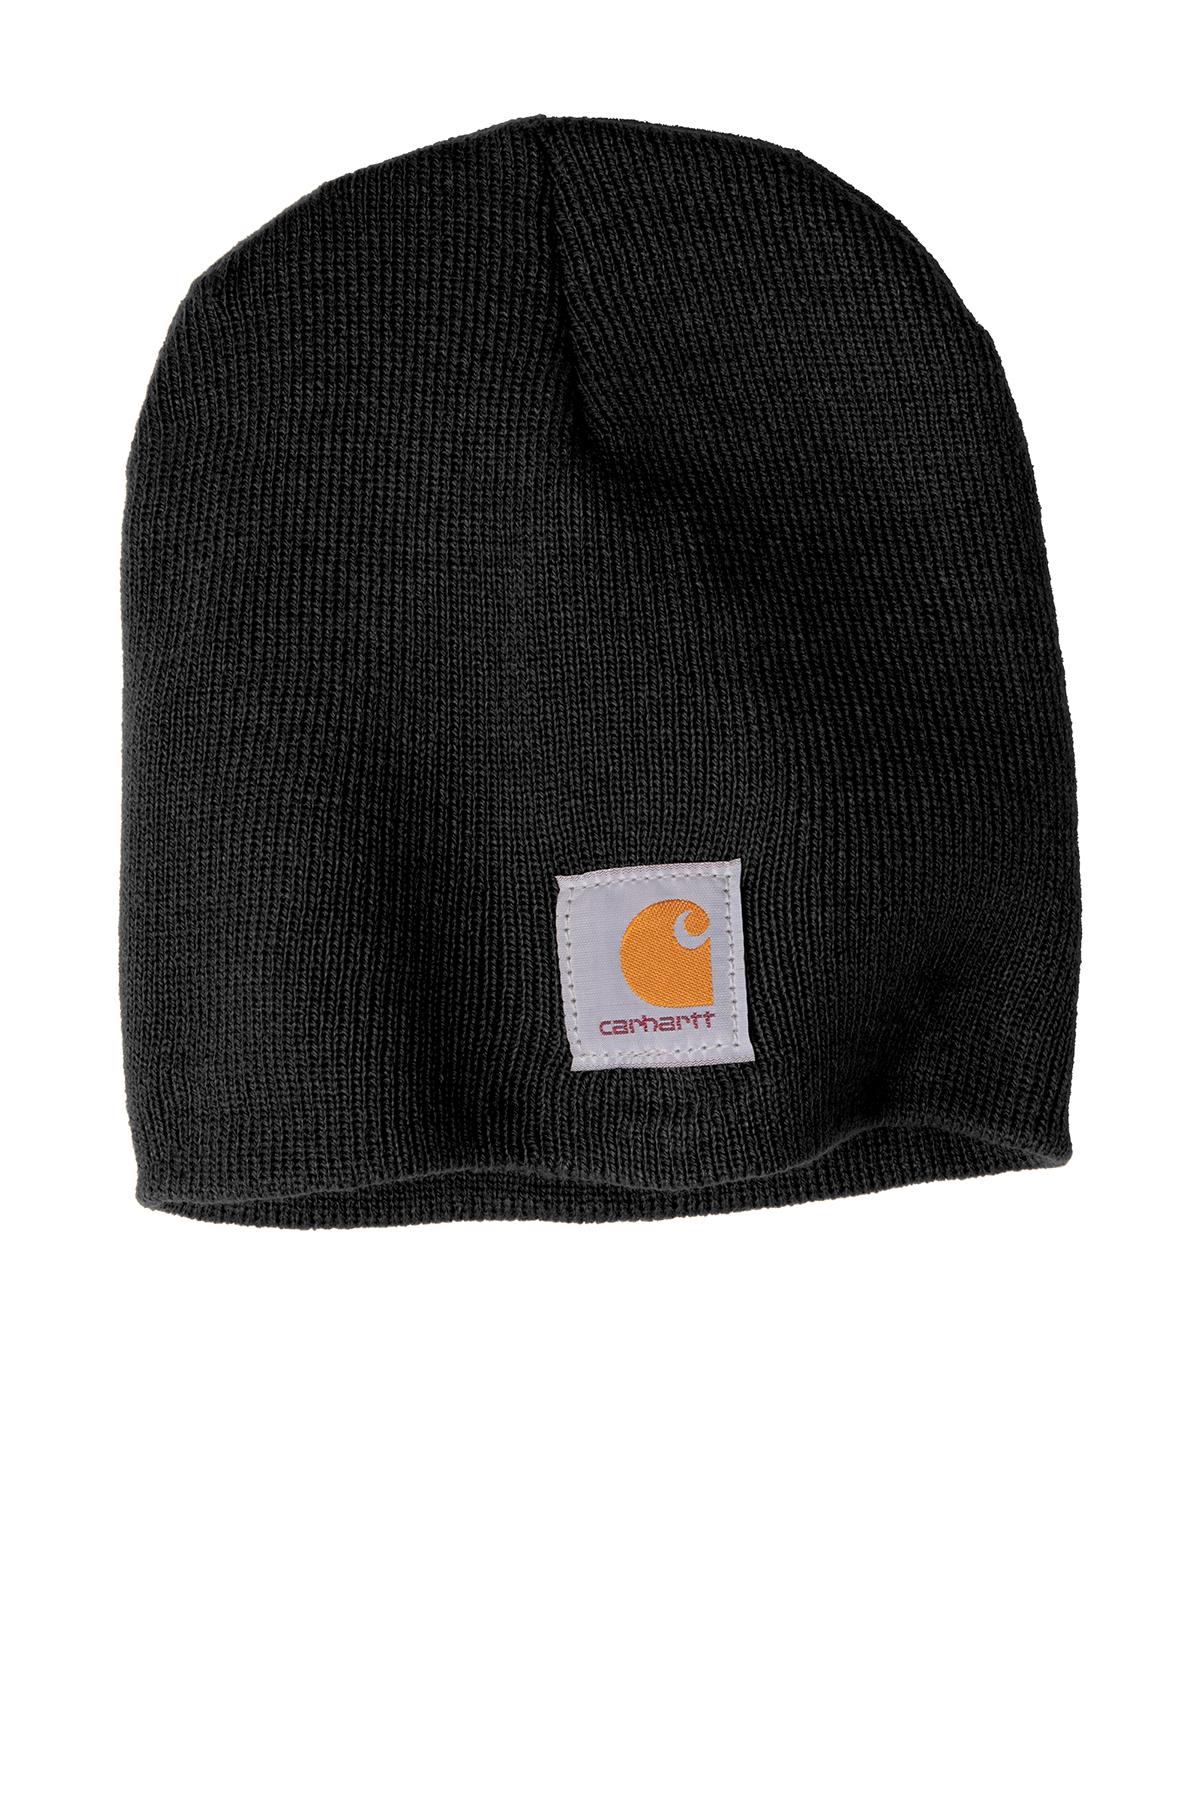 10590620 Carhartt ® Acrylic Knit Hat - Concept Design Studios, Bozeman Montana